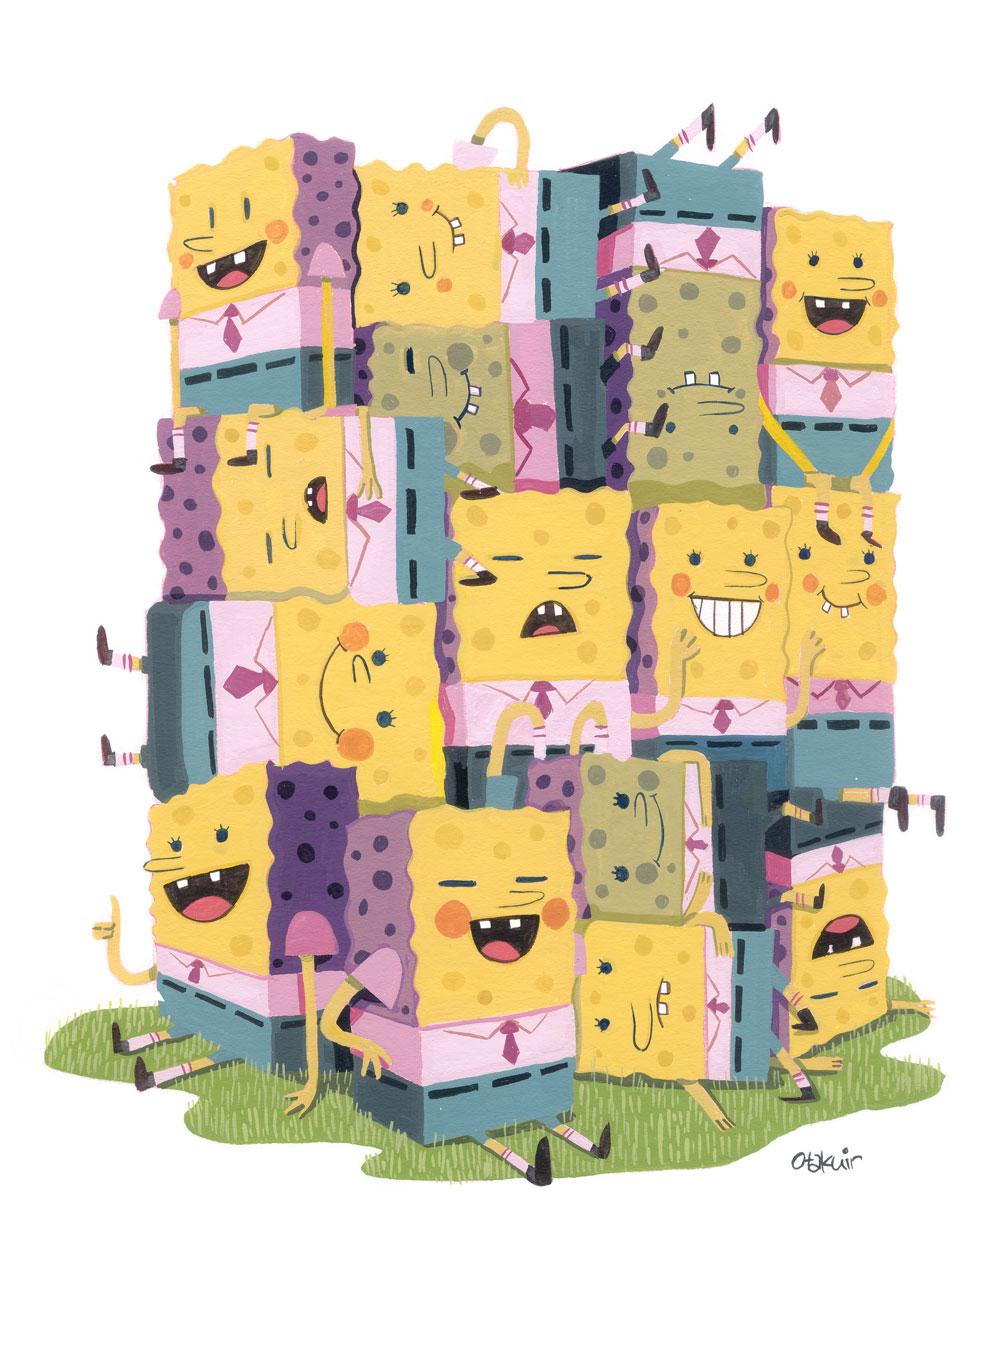 nucleus_oliverakuin_sponges_gouache